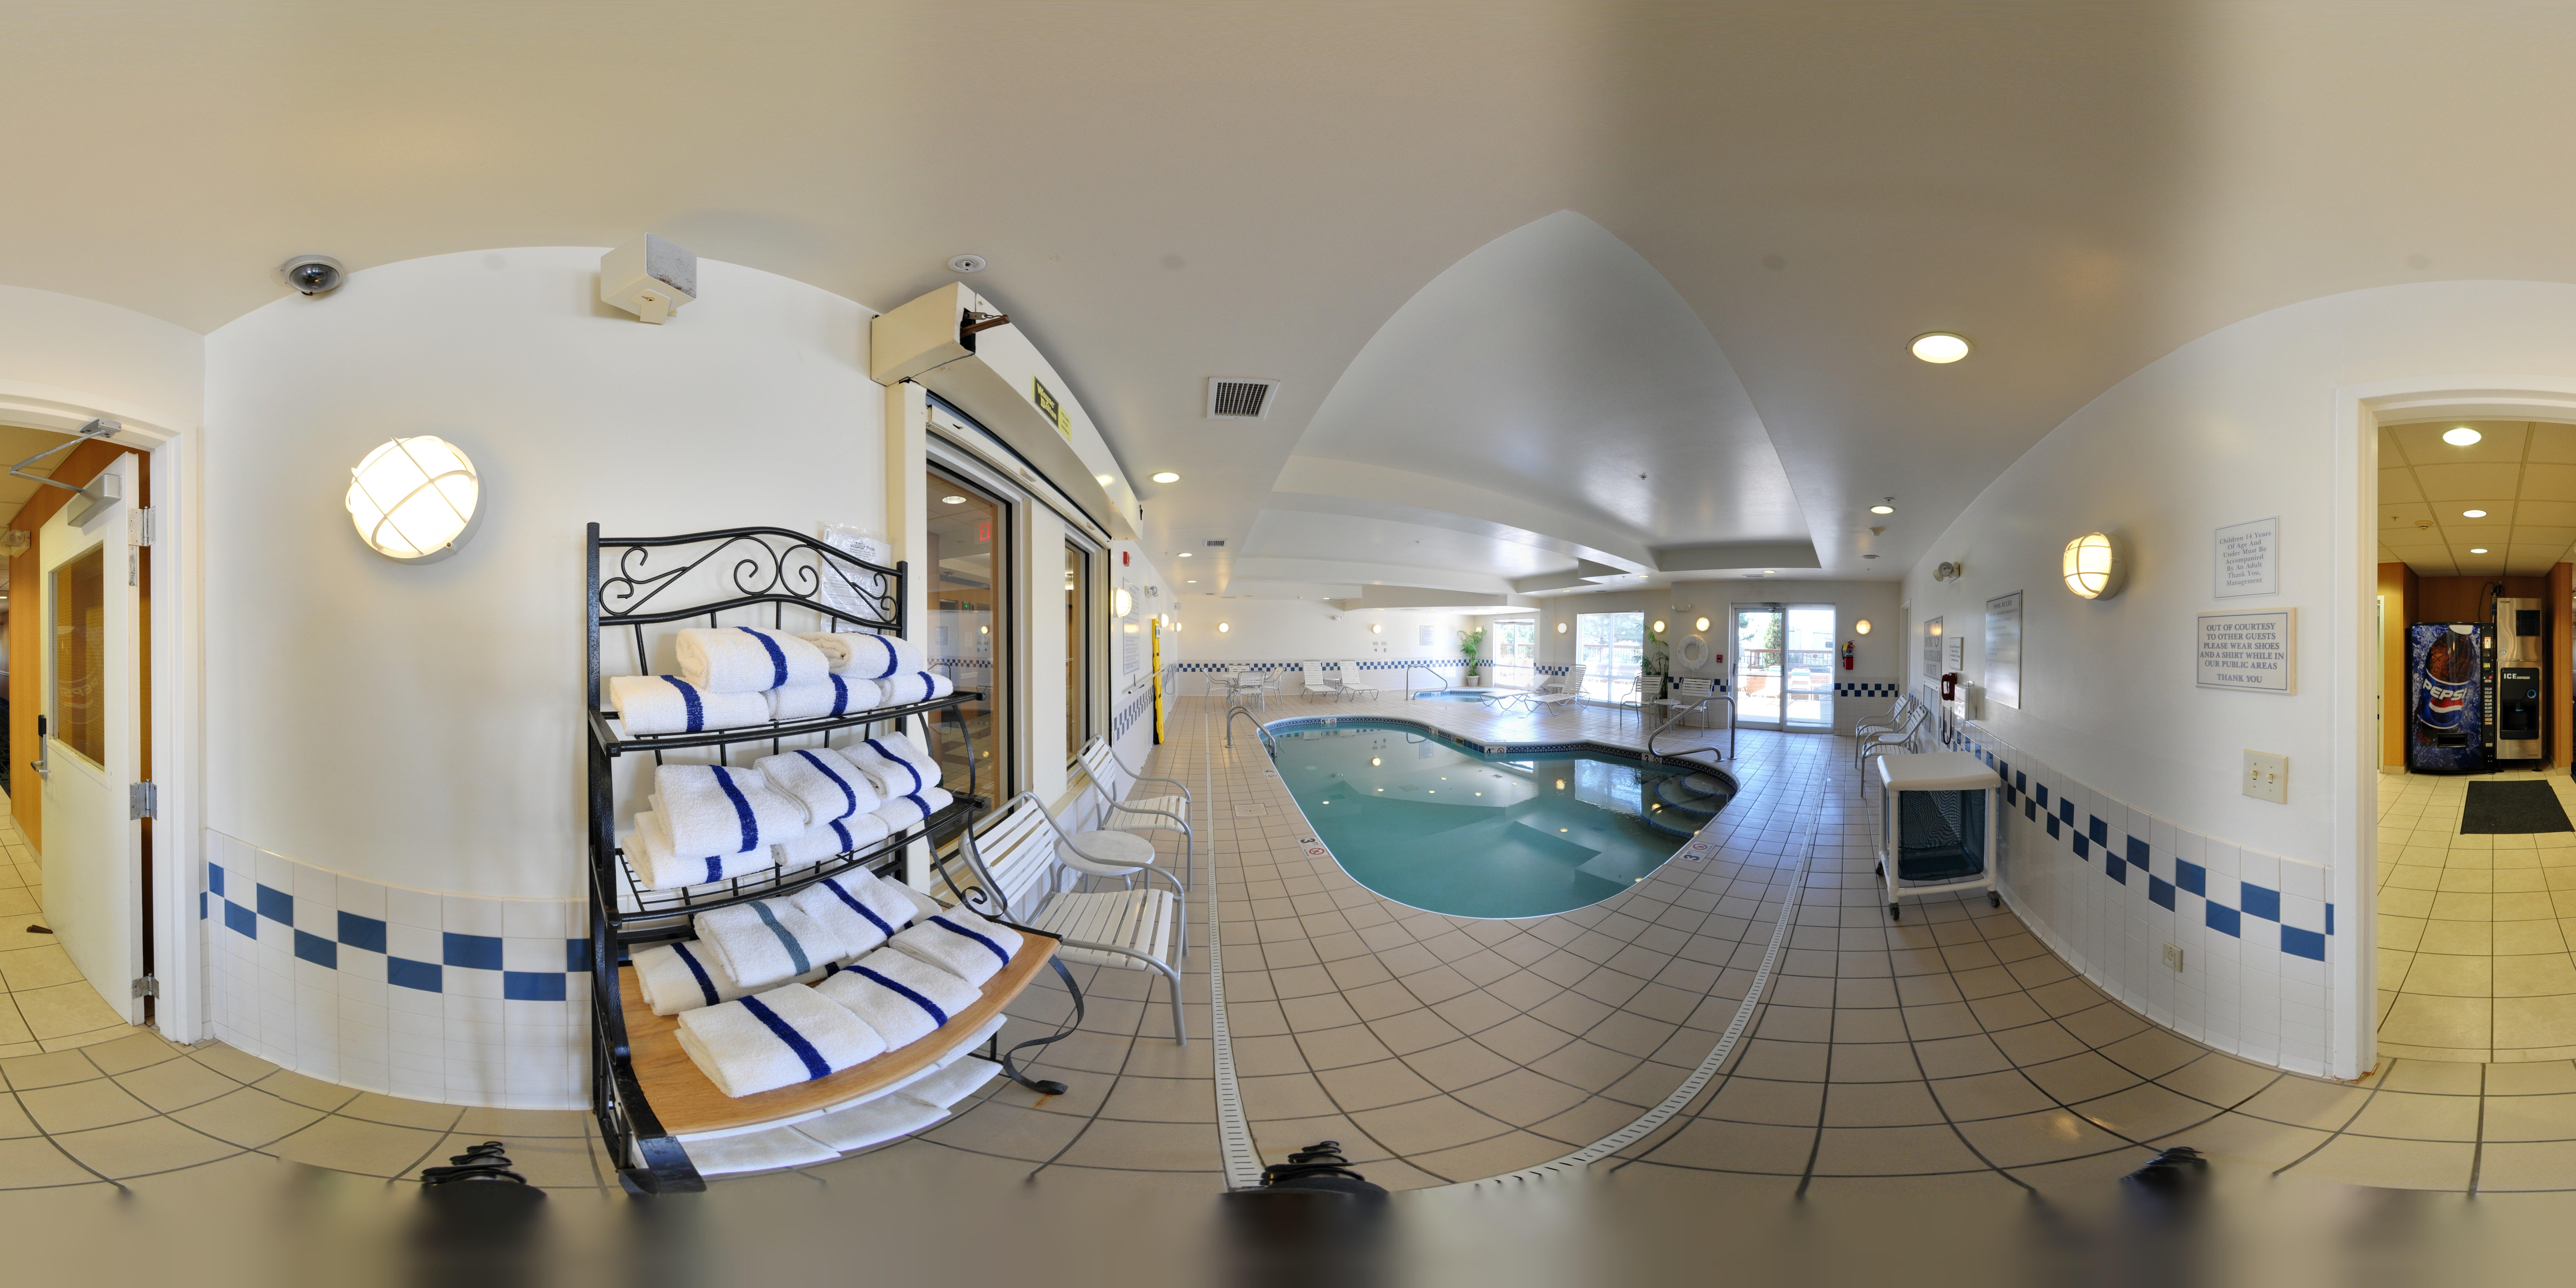 Fairfield Inn & Suites by Marriott Akron South image 33